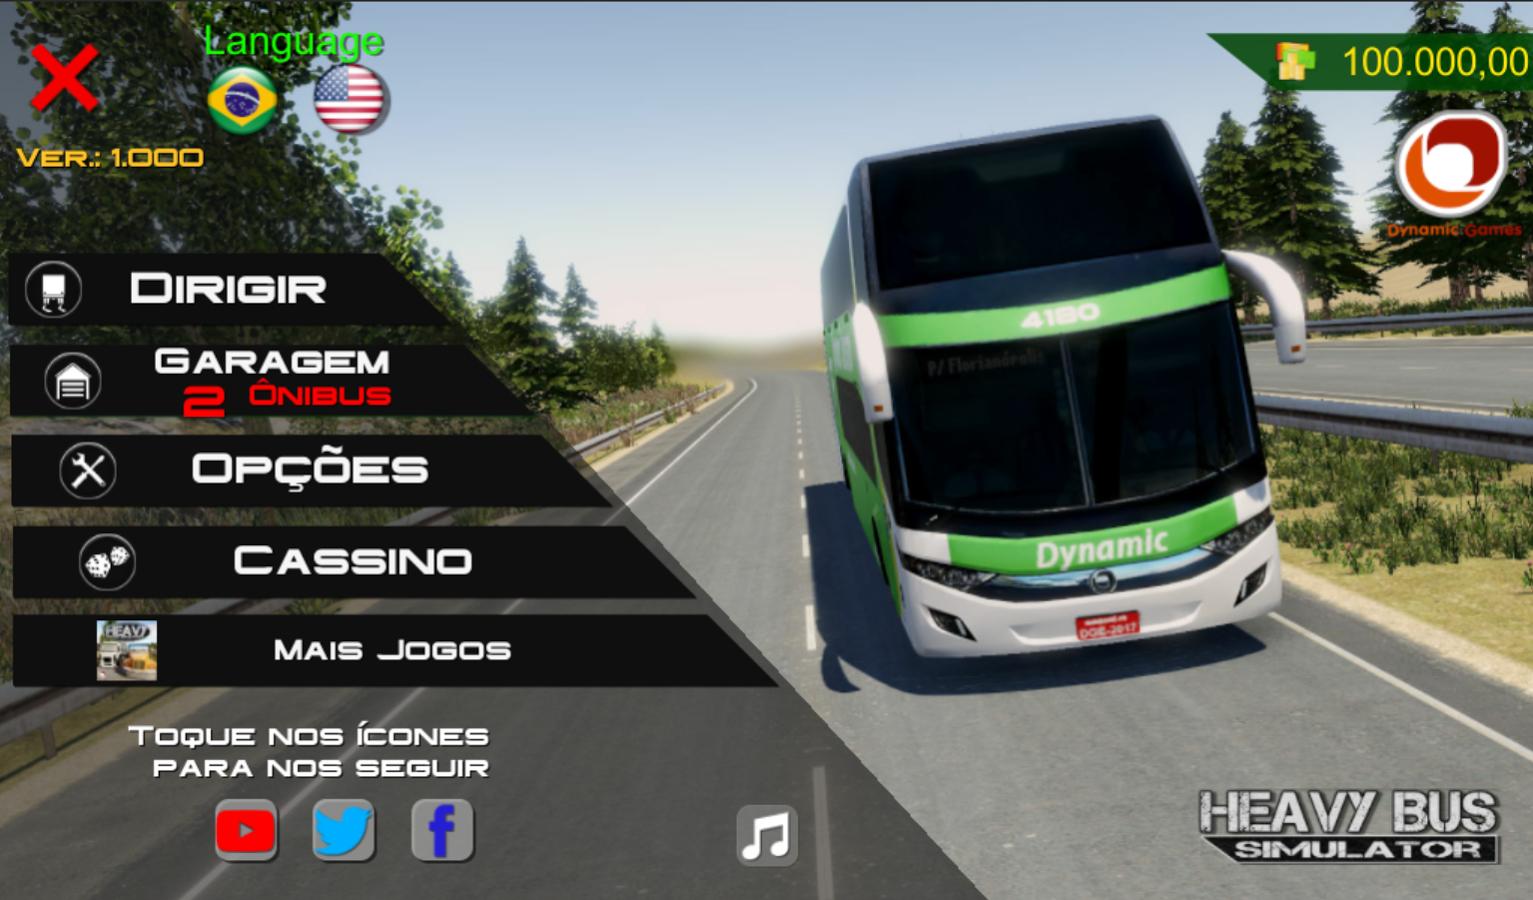 Heavy Bus Simulator Apk Mod